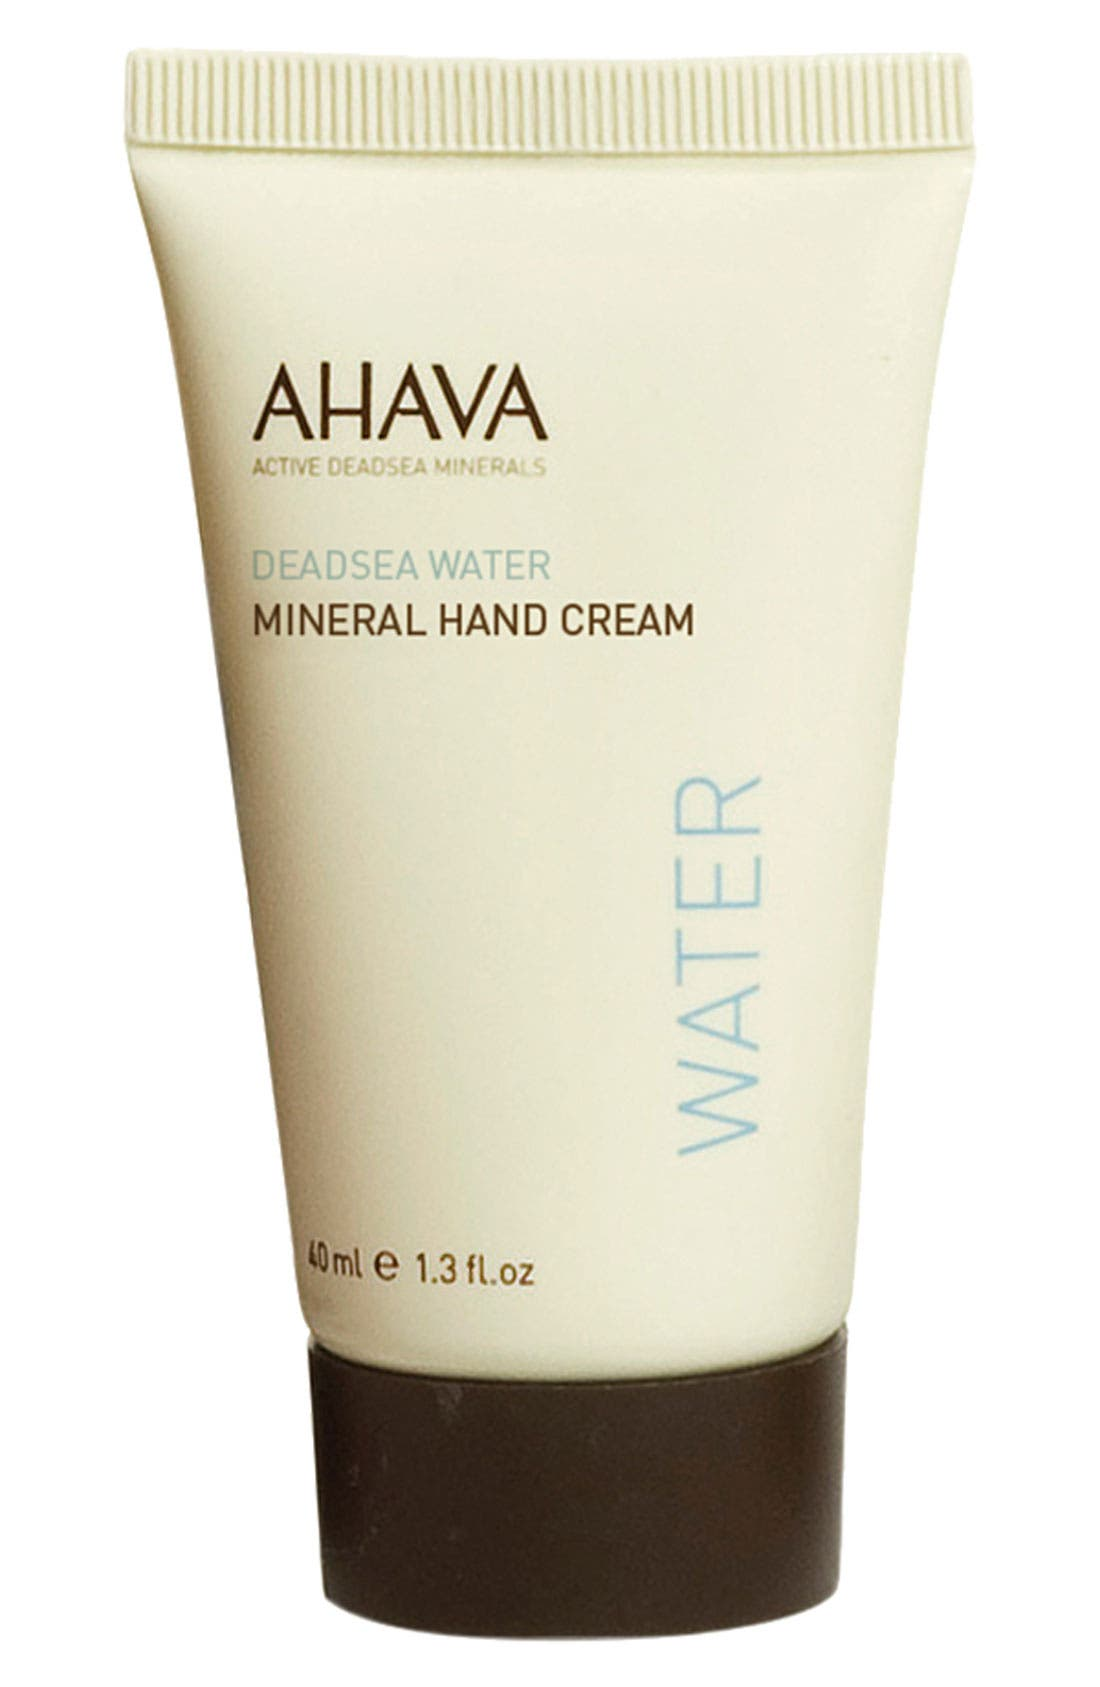 AHAVA 'Water' Travel Size Mineral Hand Cream